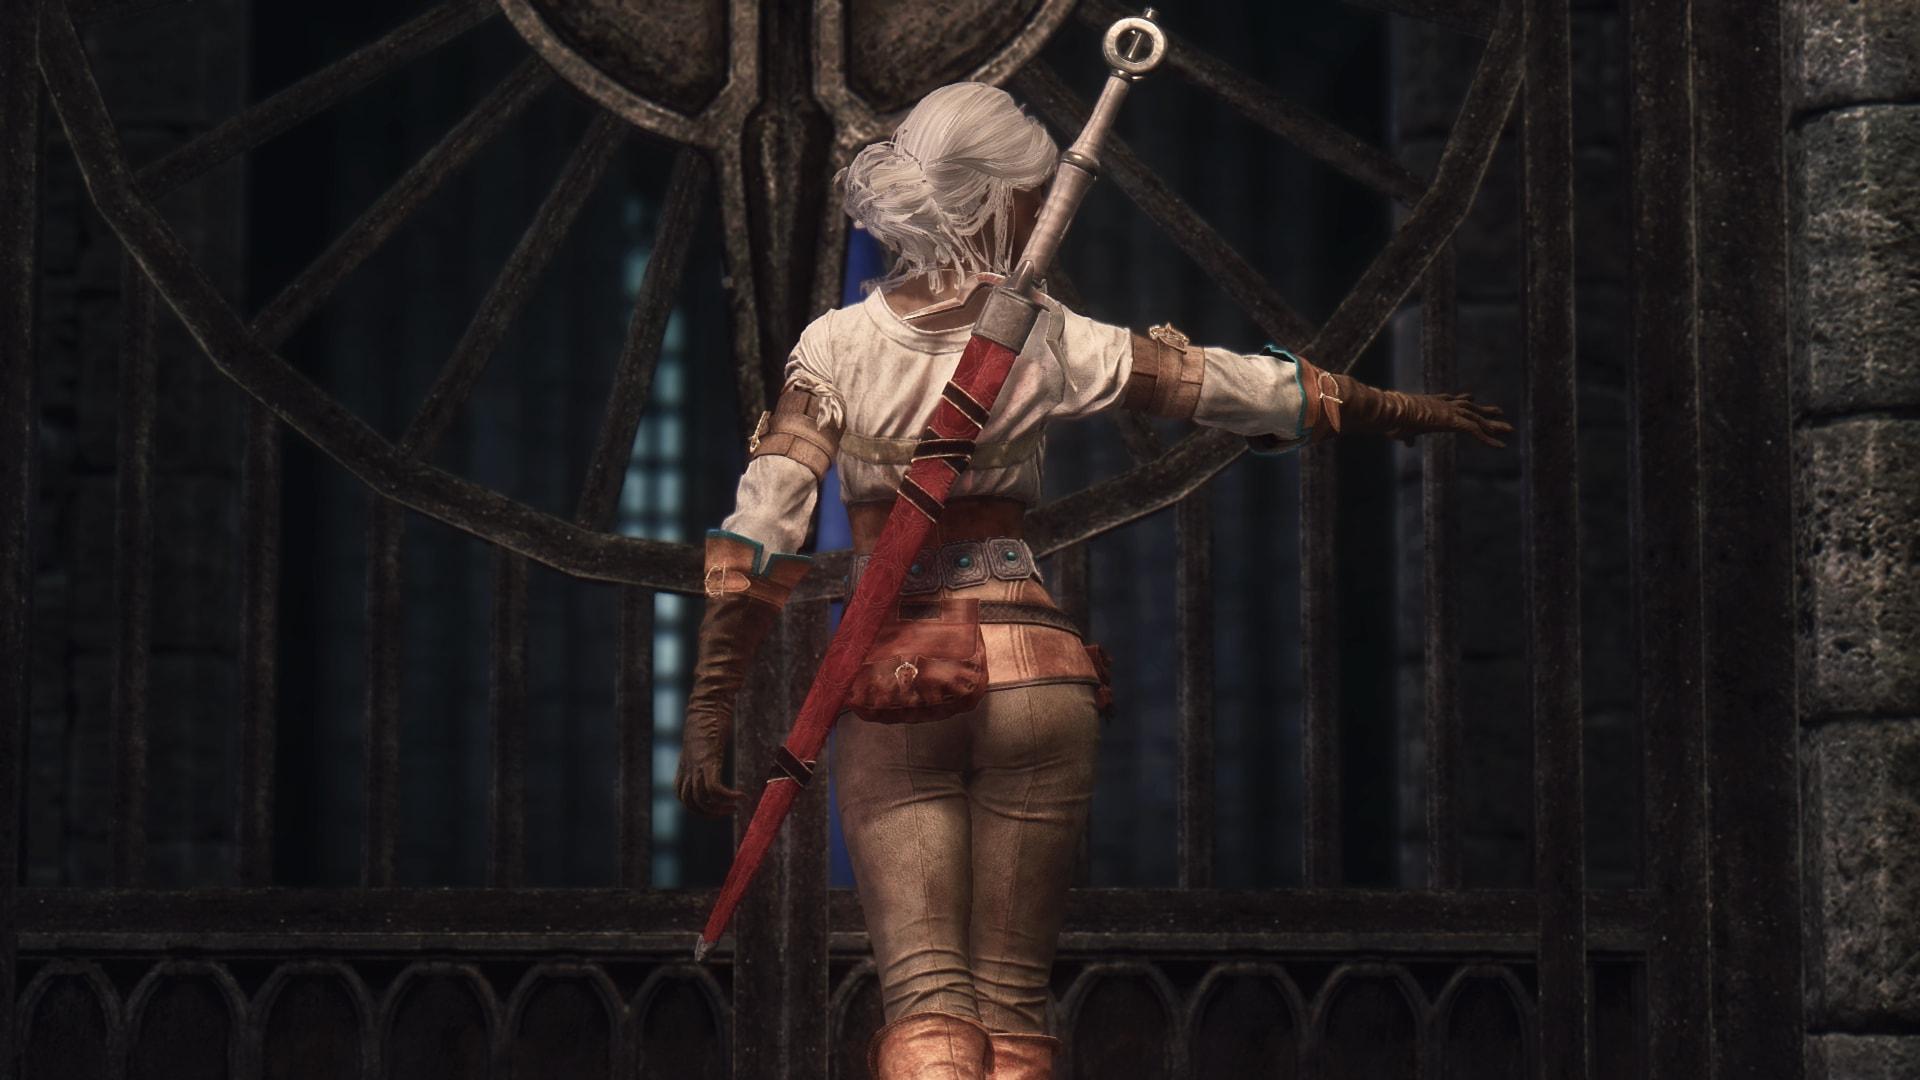 The Witcher 3 Ciris Outfit | Броня Цири из Ведьмак 3